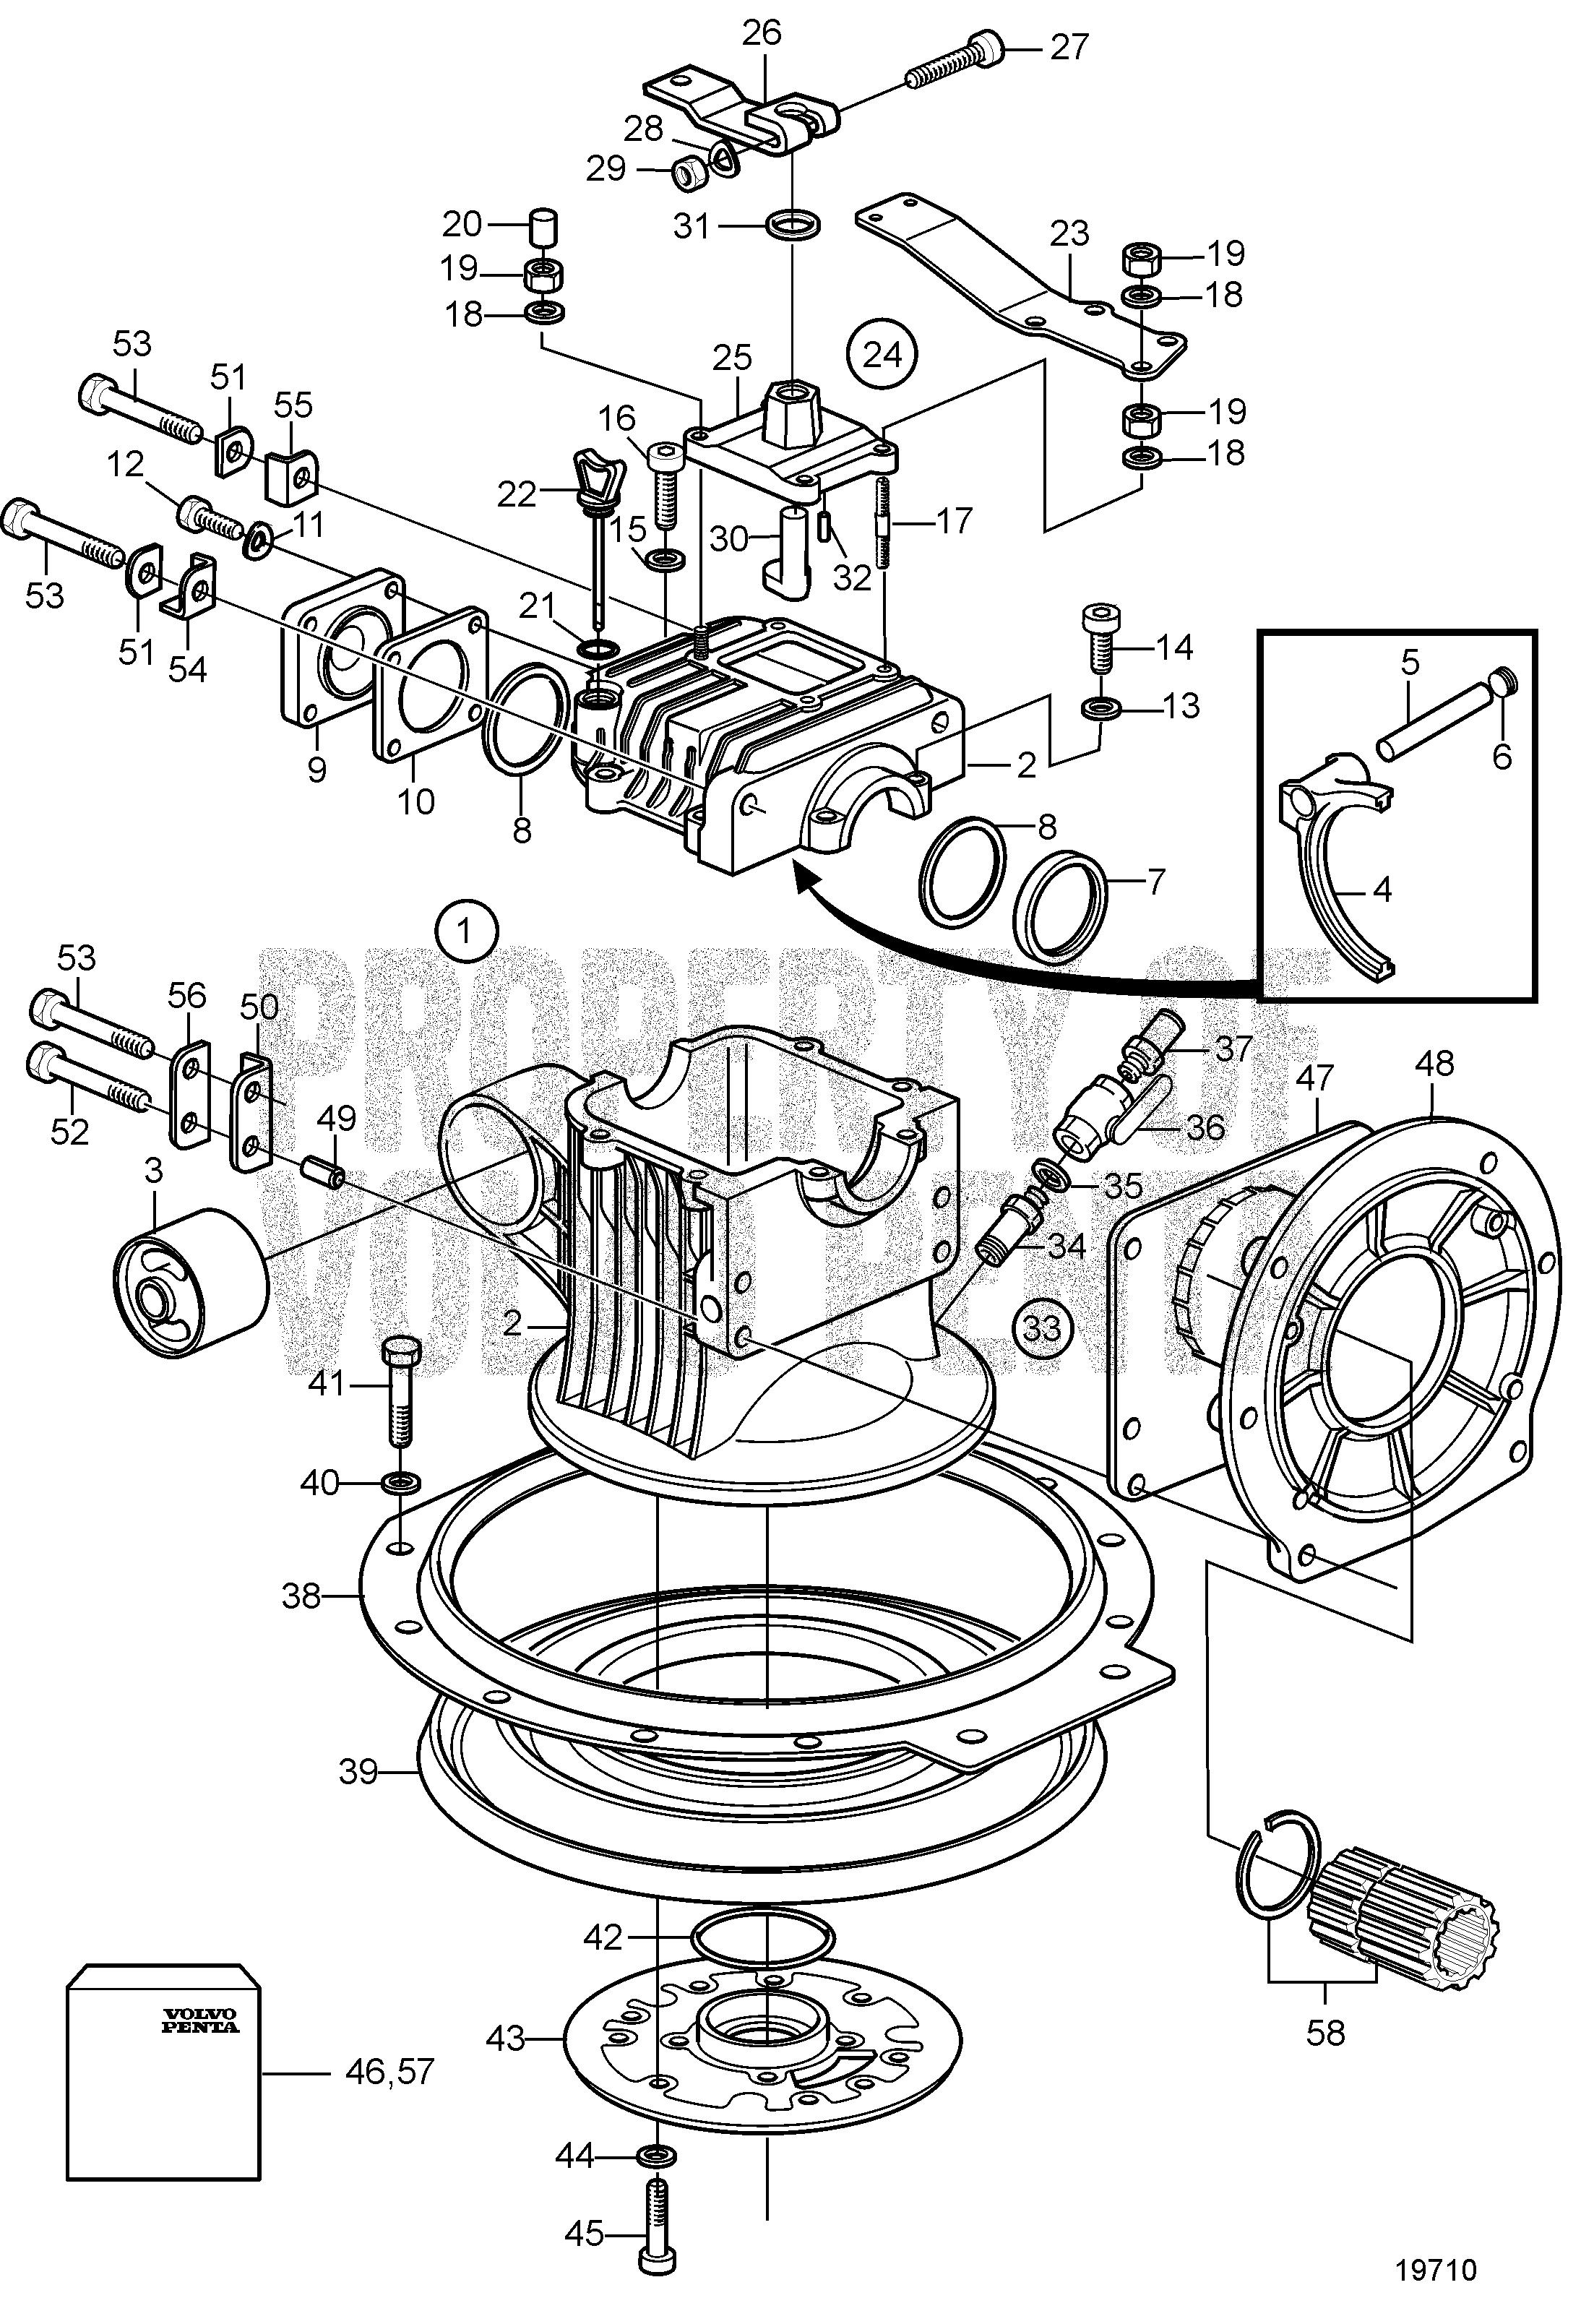 volvo penta 120s saildrive manual simple instruction guide books u2022 rh catsmile co